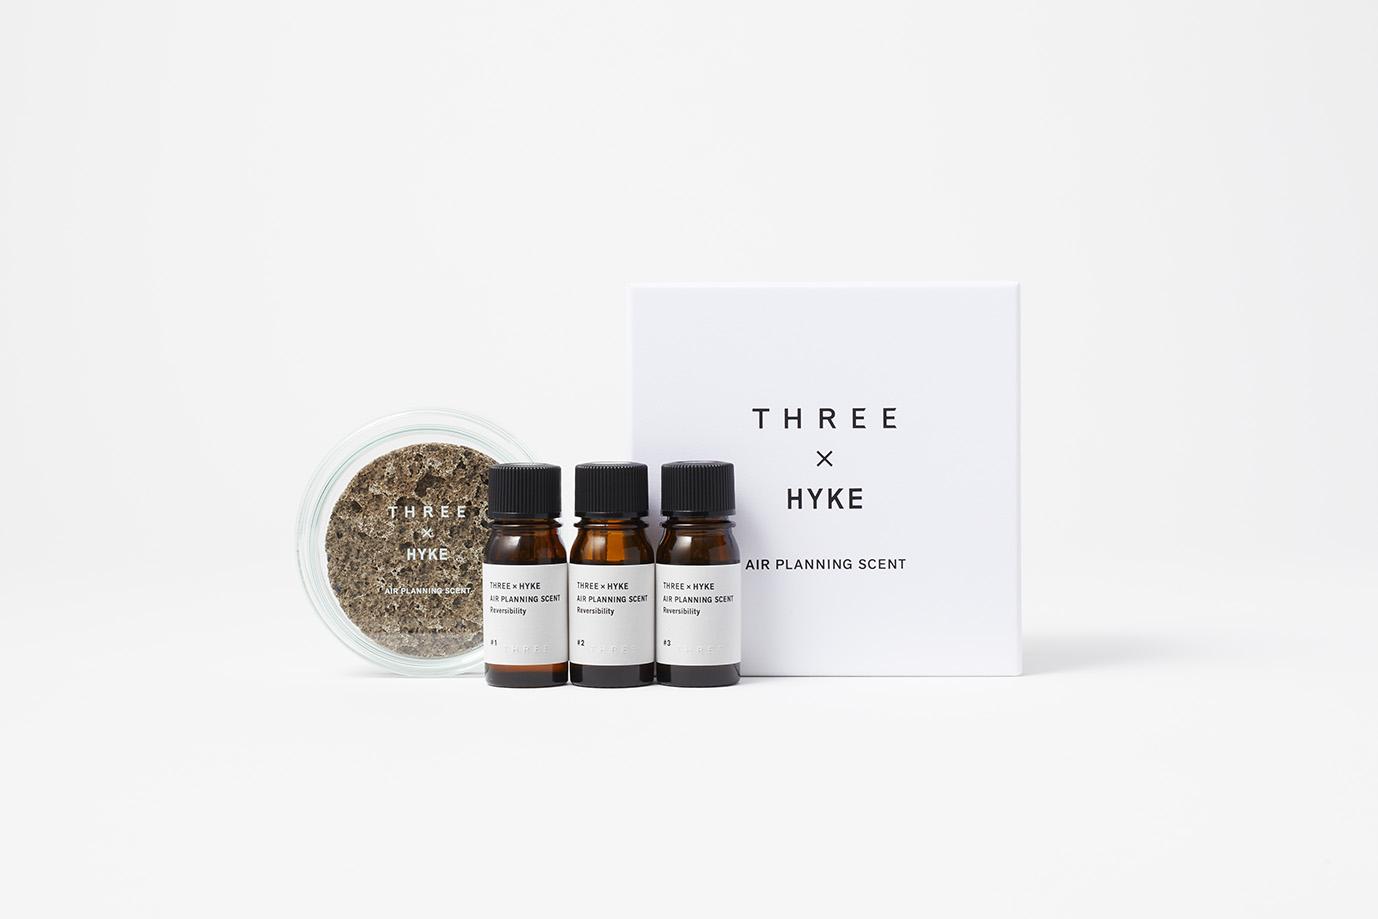 THREE × HYKE エアープランニングセント リバーサビリティ ¥10,000 (3月31日数量限定・店舗限定発売)